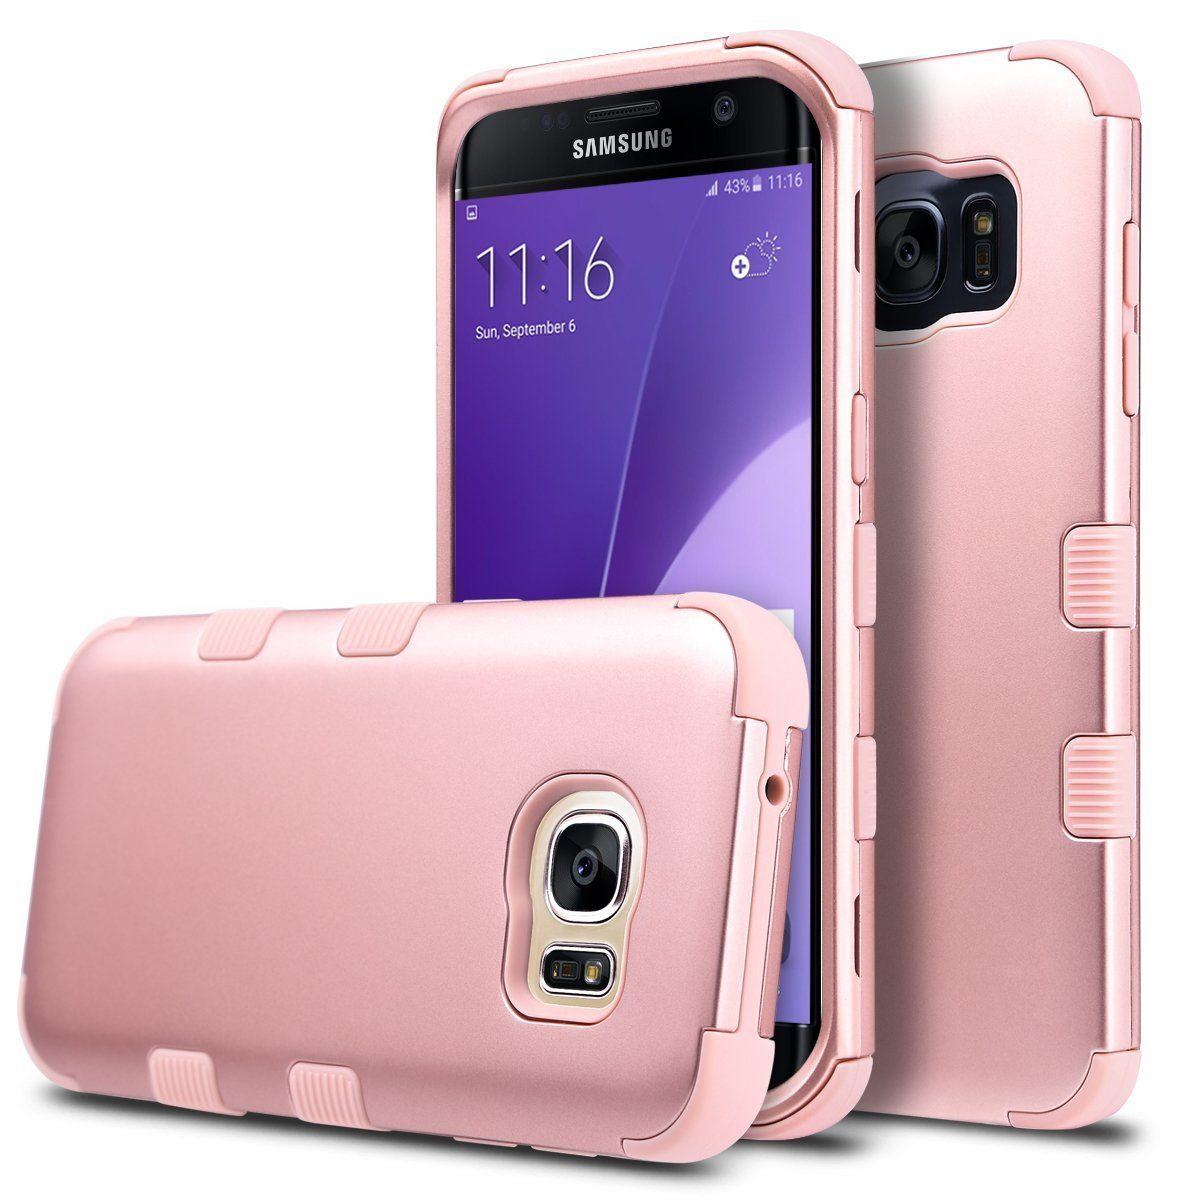 Robot Check Girly Phone Cases Samsung Galaxy S7 Edge Cases Samsung Galaxy S7 Edge